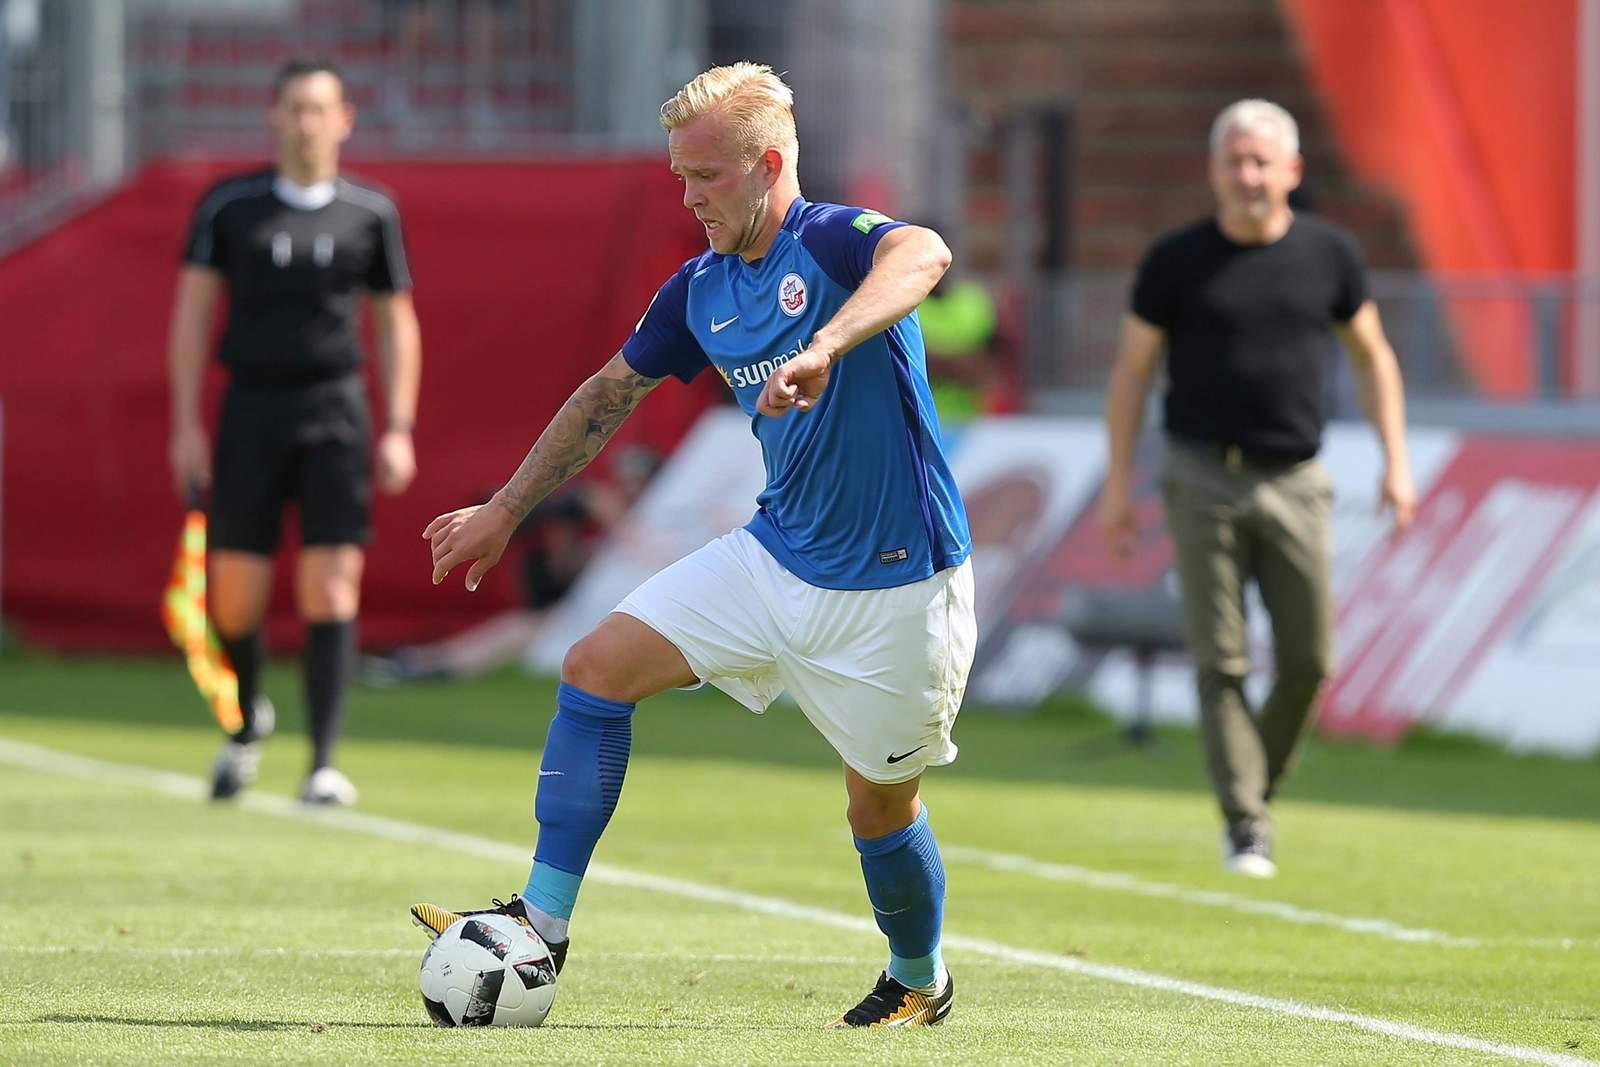 Marcel Hilßner am Ball für Hansa Rostock